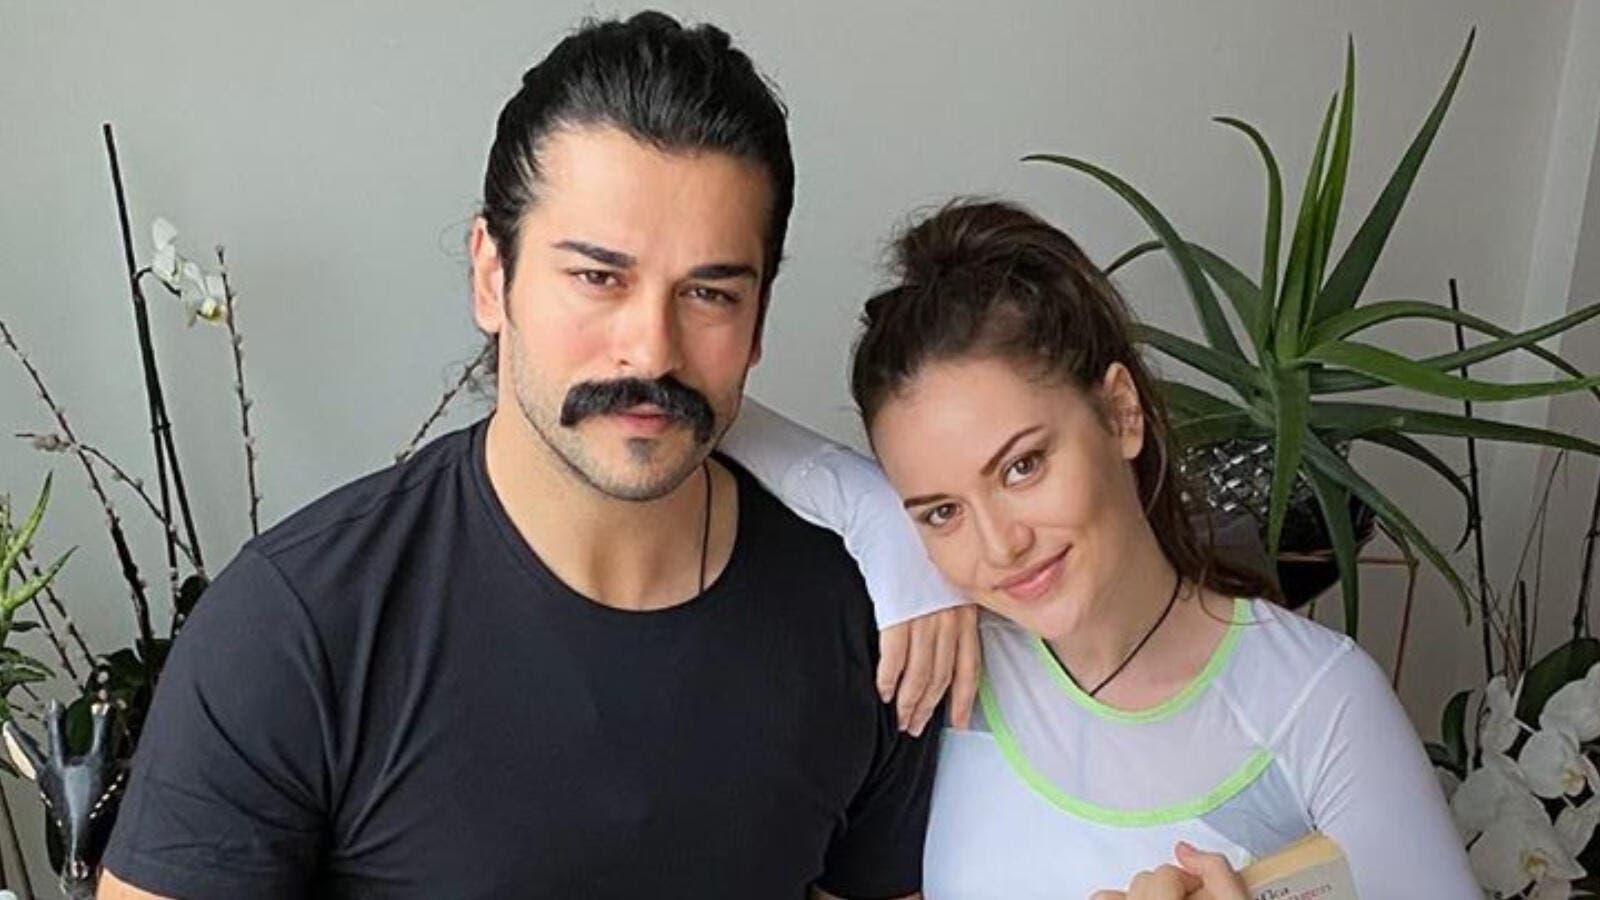 I Appreciate You Wifey! Burak Özçivit Gifts Spouse Fahriye Evcen Two  Presents Worth 68,000 Dollars! (Picture) | Al Bawaba